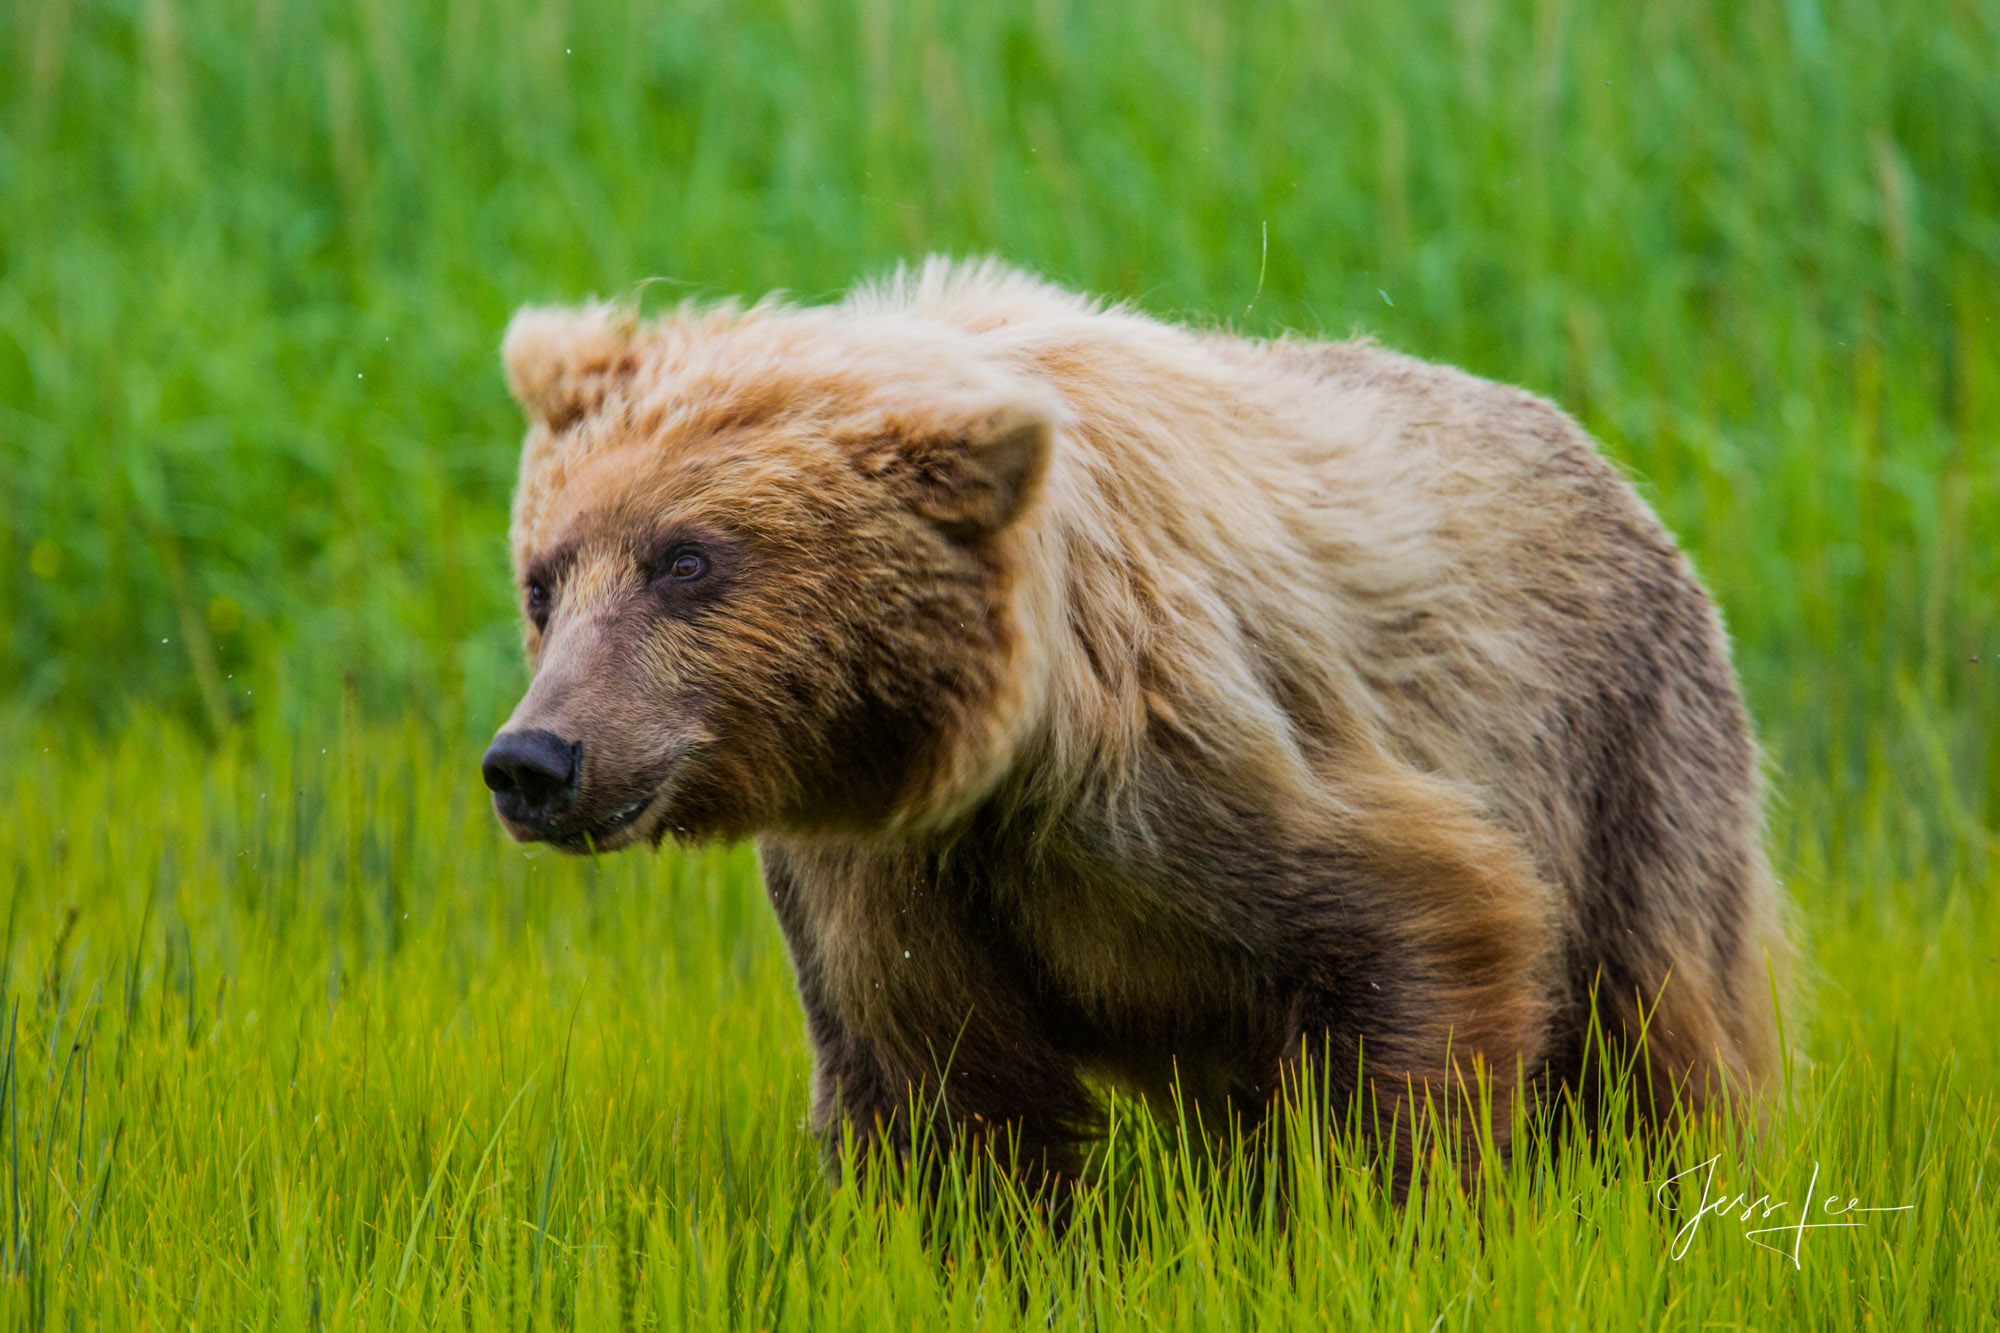 Alaska*, bear*, brown bear*, brown bears*, brown*, coastal*, cubs*, grizzlies*, Grizzly*, Jess Lee*, Cooke inlet, legendary photographer*, national park*, sow*, wildlife*, wildlife photographer*, Griz, photo